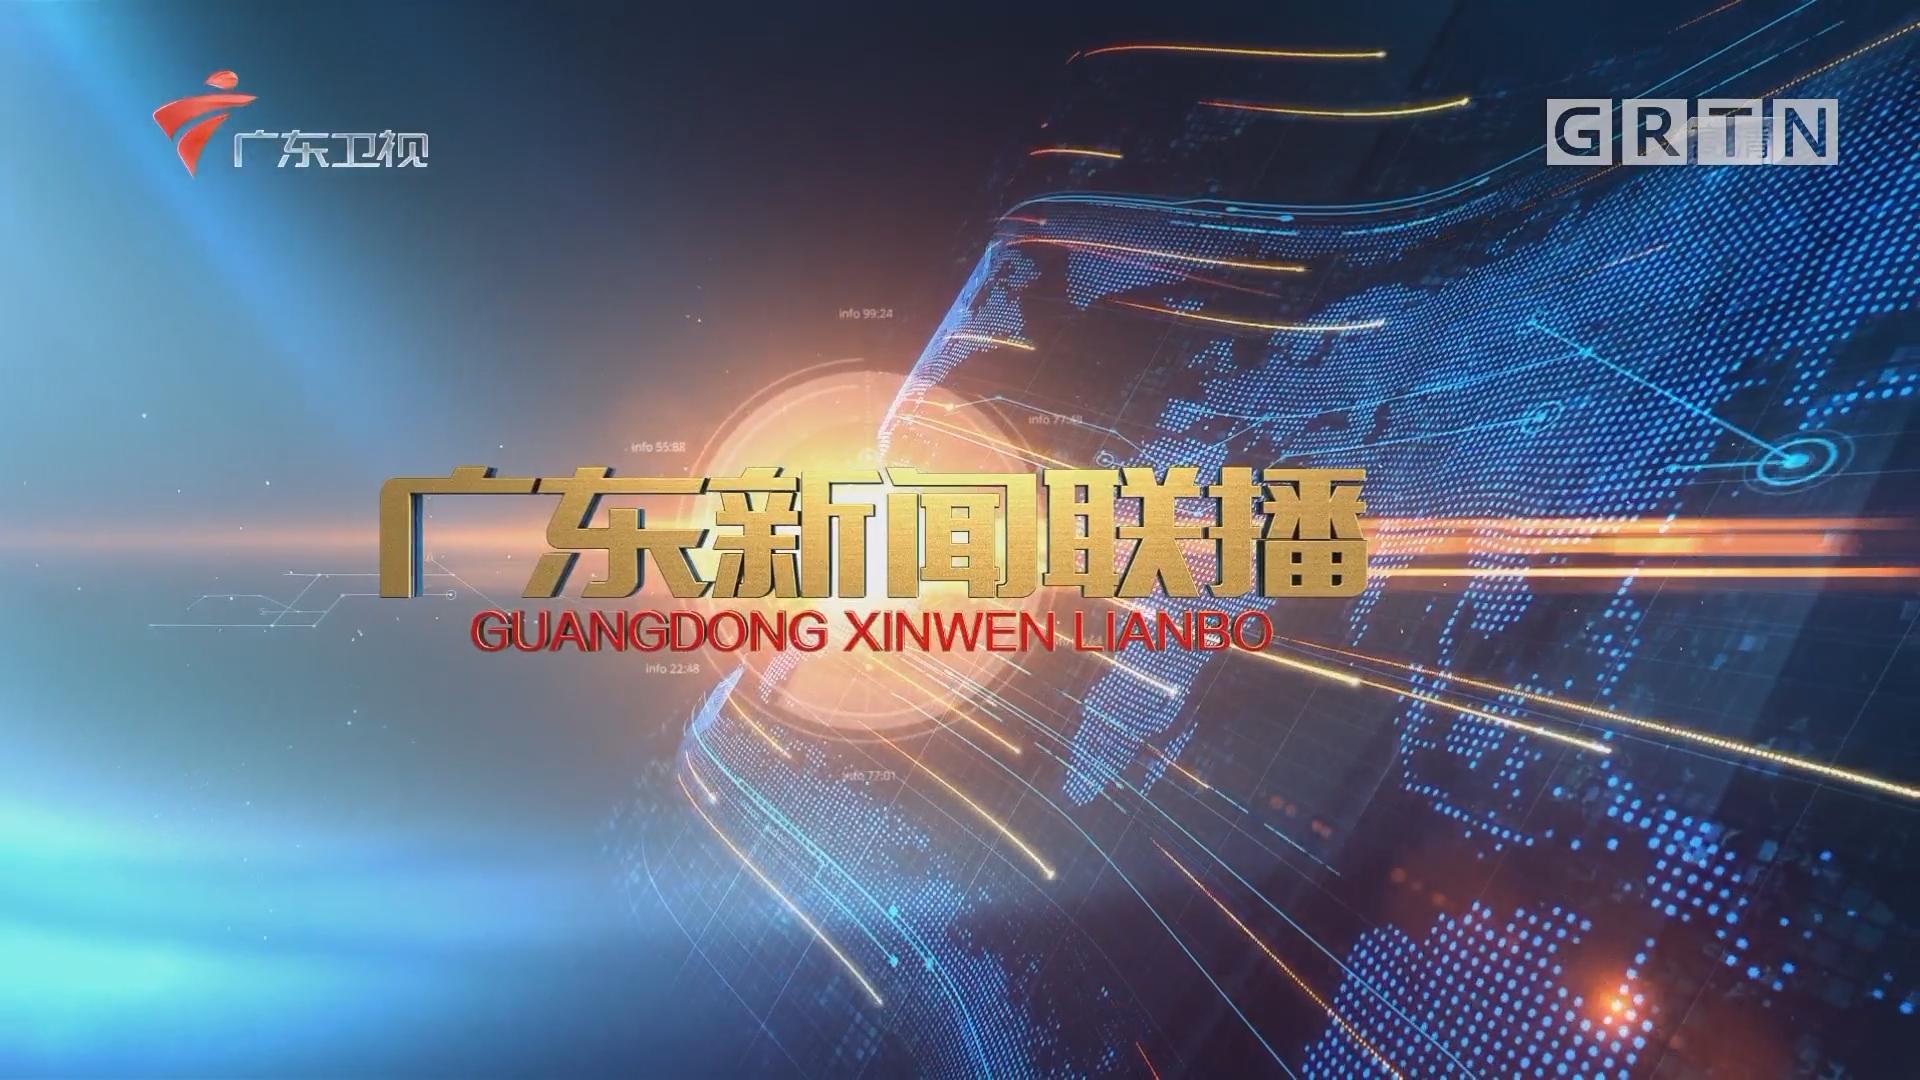 [HD][2018-07-20]广东新闻联播:省委常委会召开会议 李希主持会议